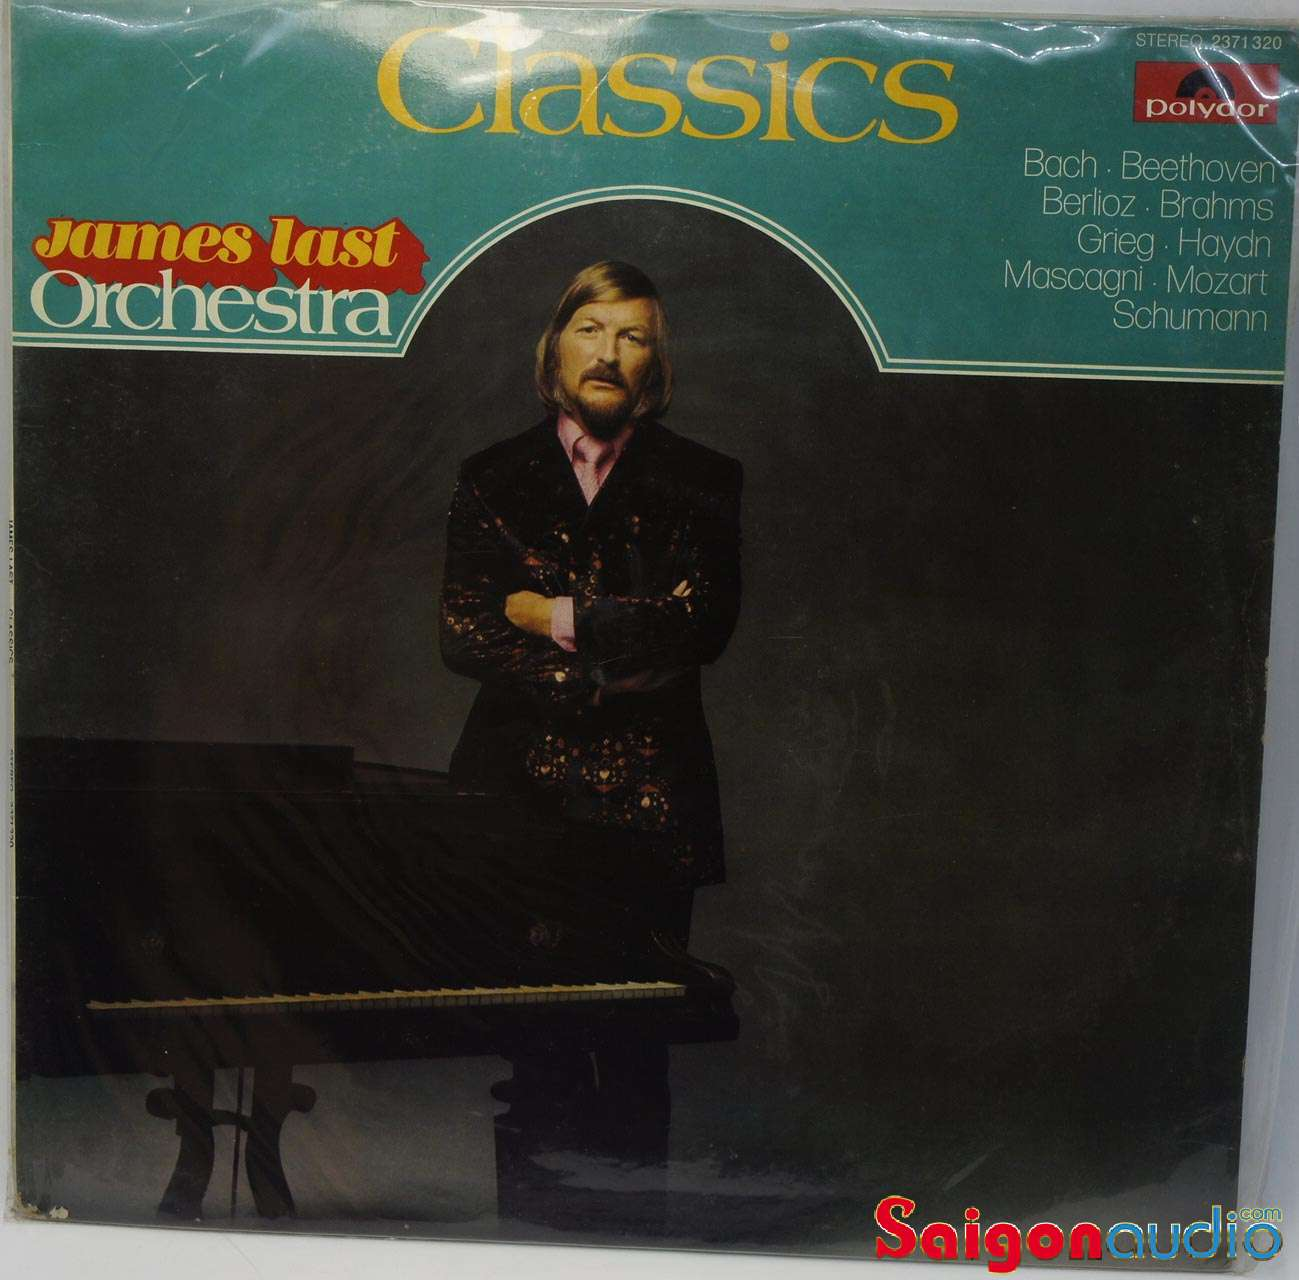 Đĩa than LP James Last Orchestra Classics (Bach, Beethoven, Berlioz, Brahms, Mozart, Schuman)